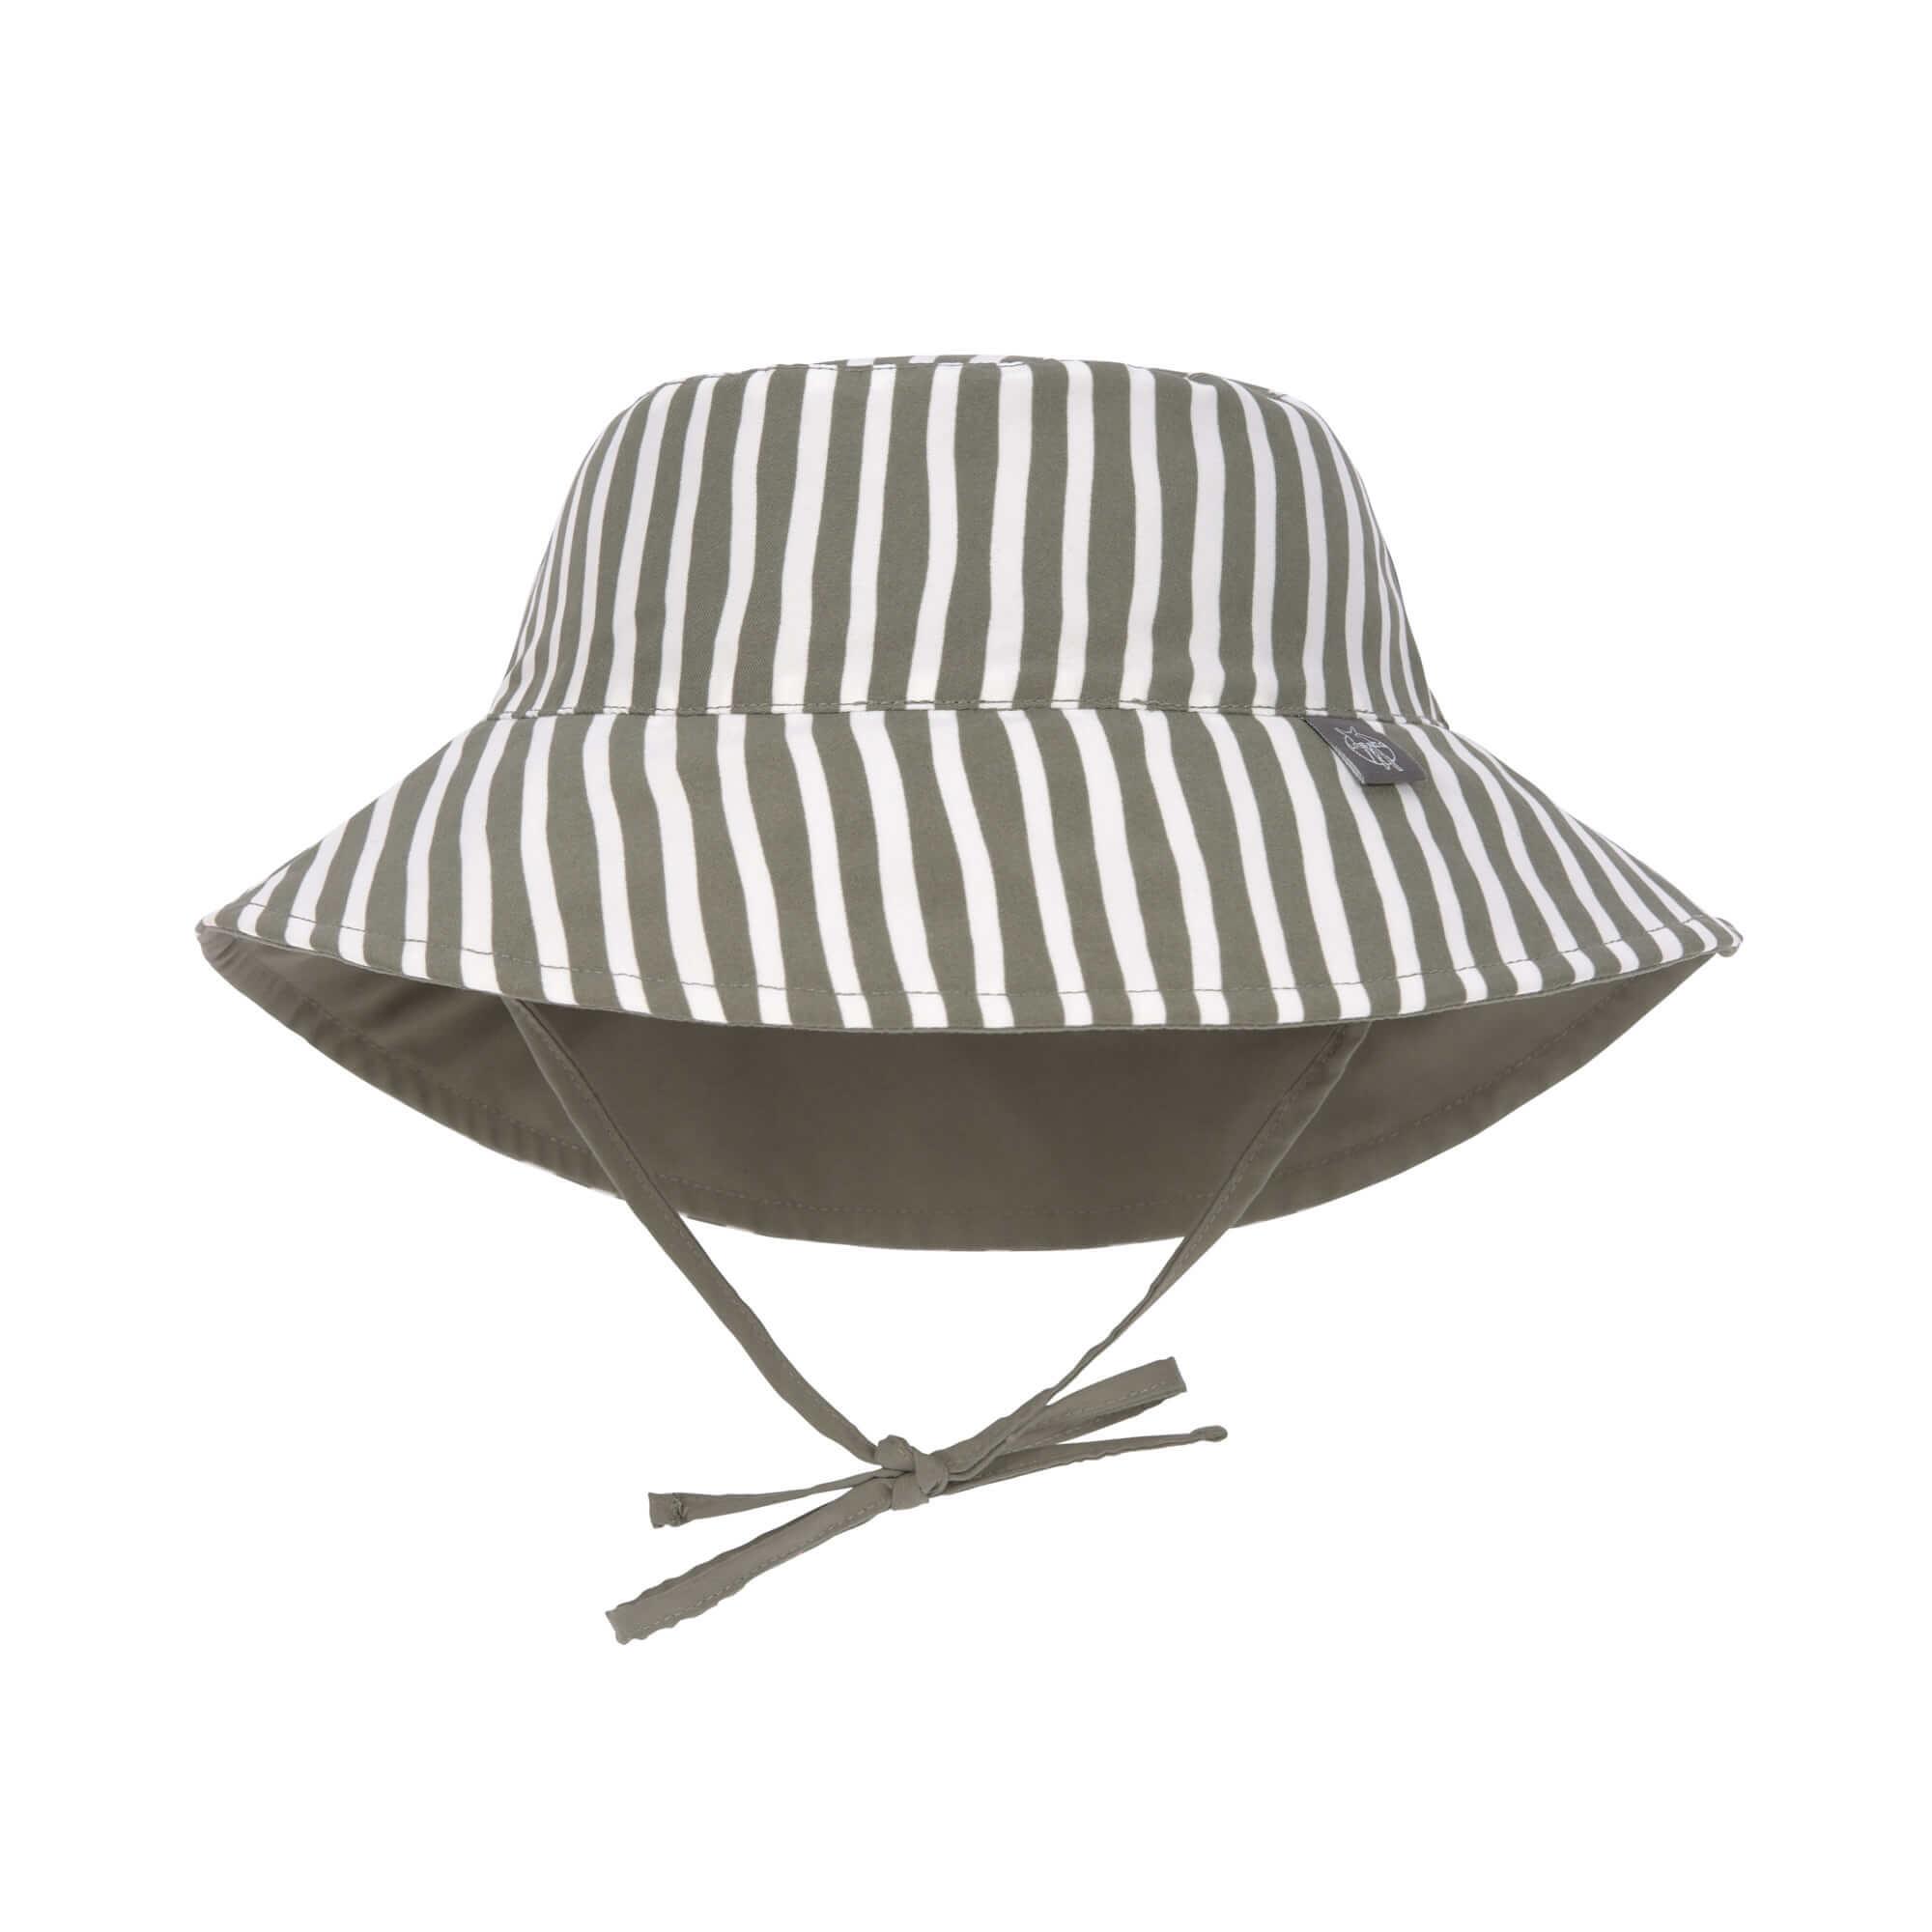 Lässig Splash & Fun Sun Protection Zonnehoed Vissershoed met UV bescherming - Stripes olive 19-36 ma